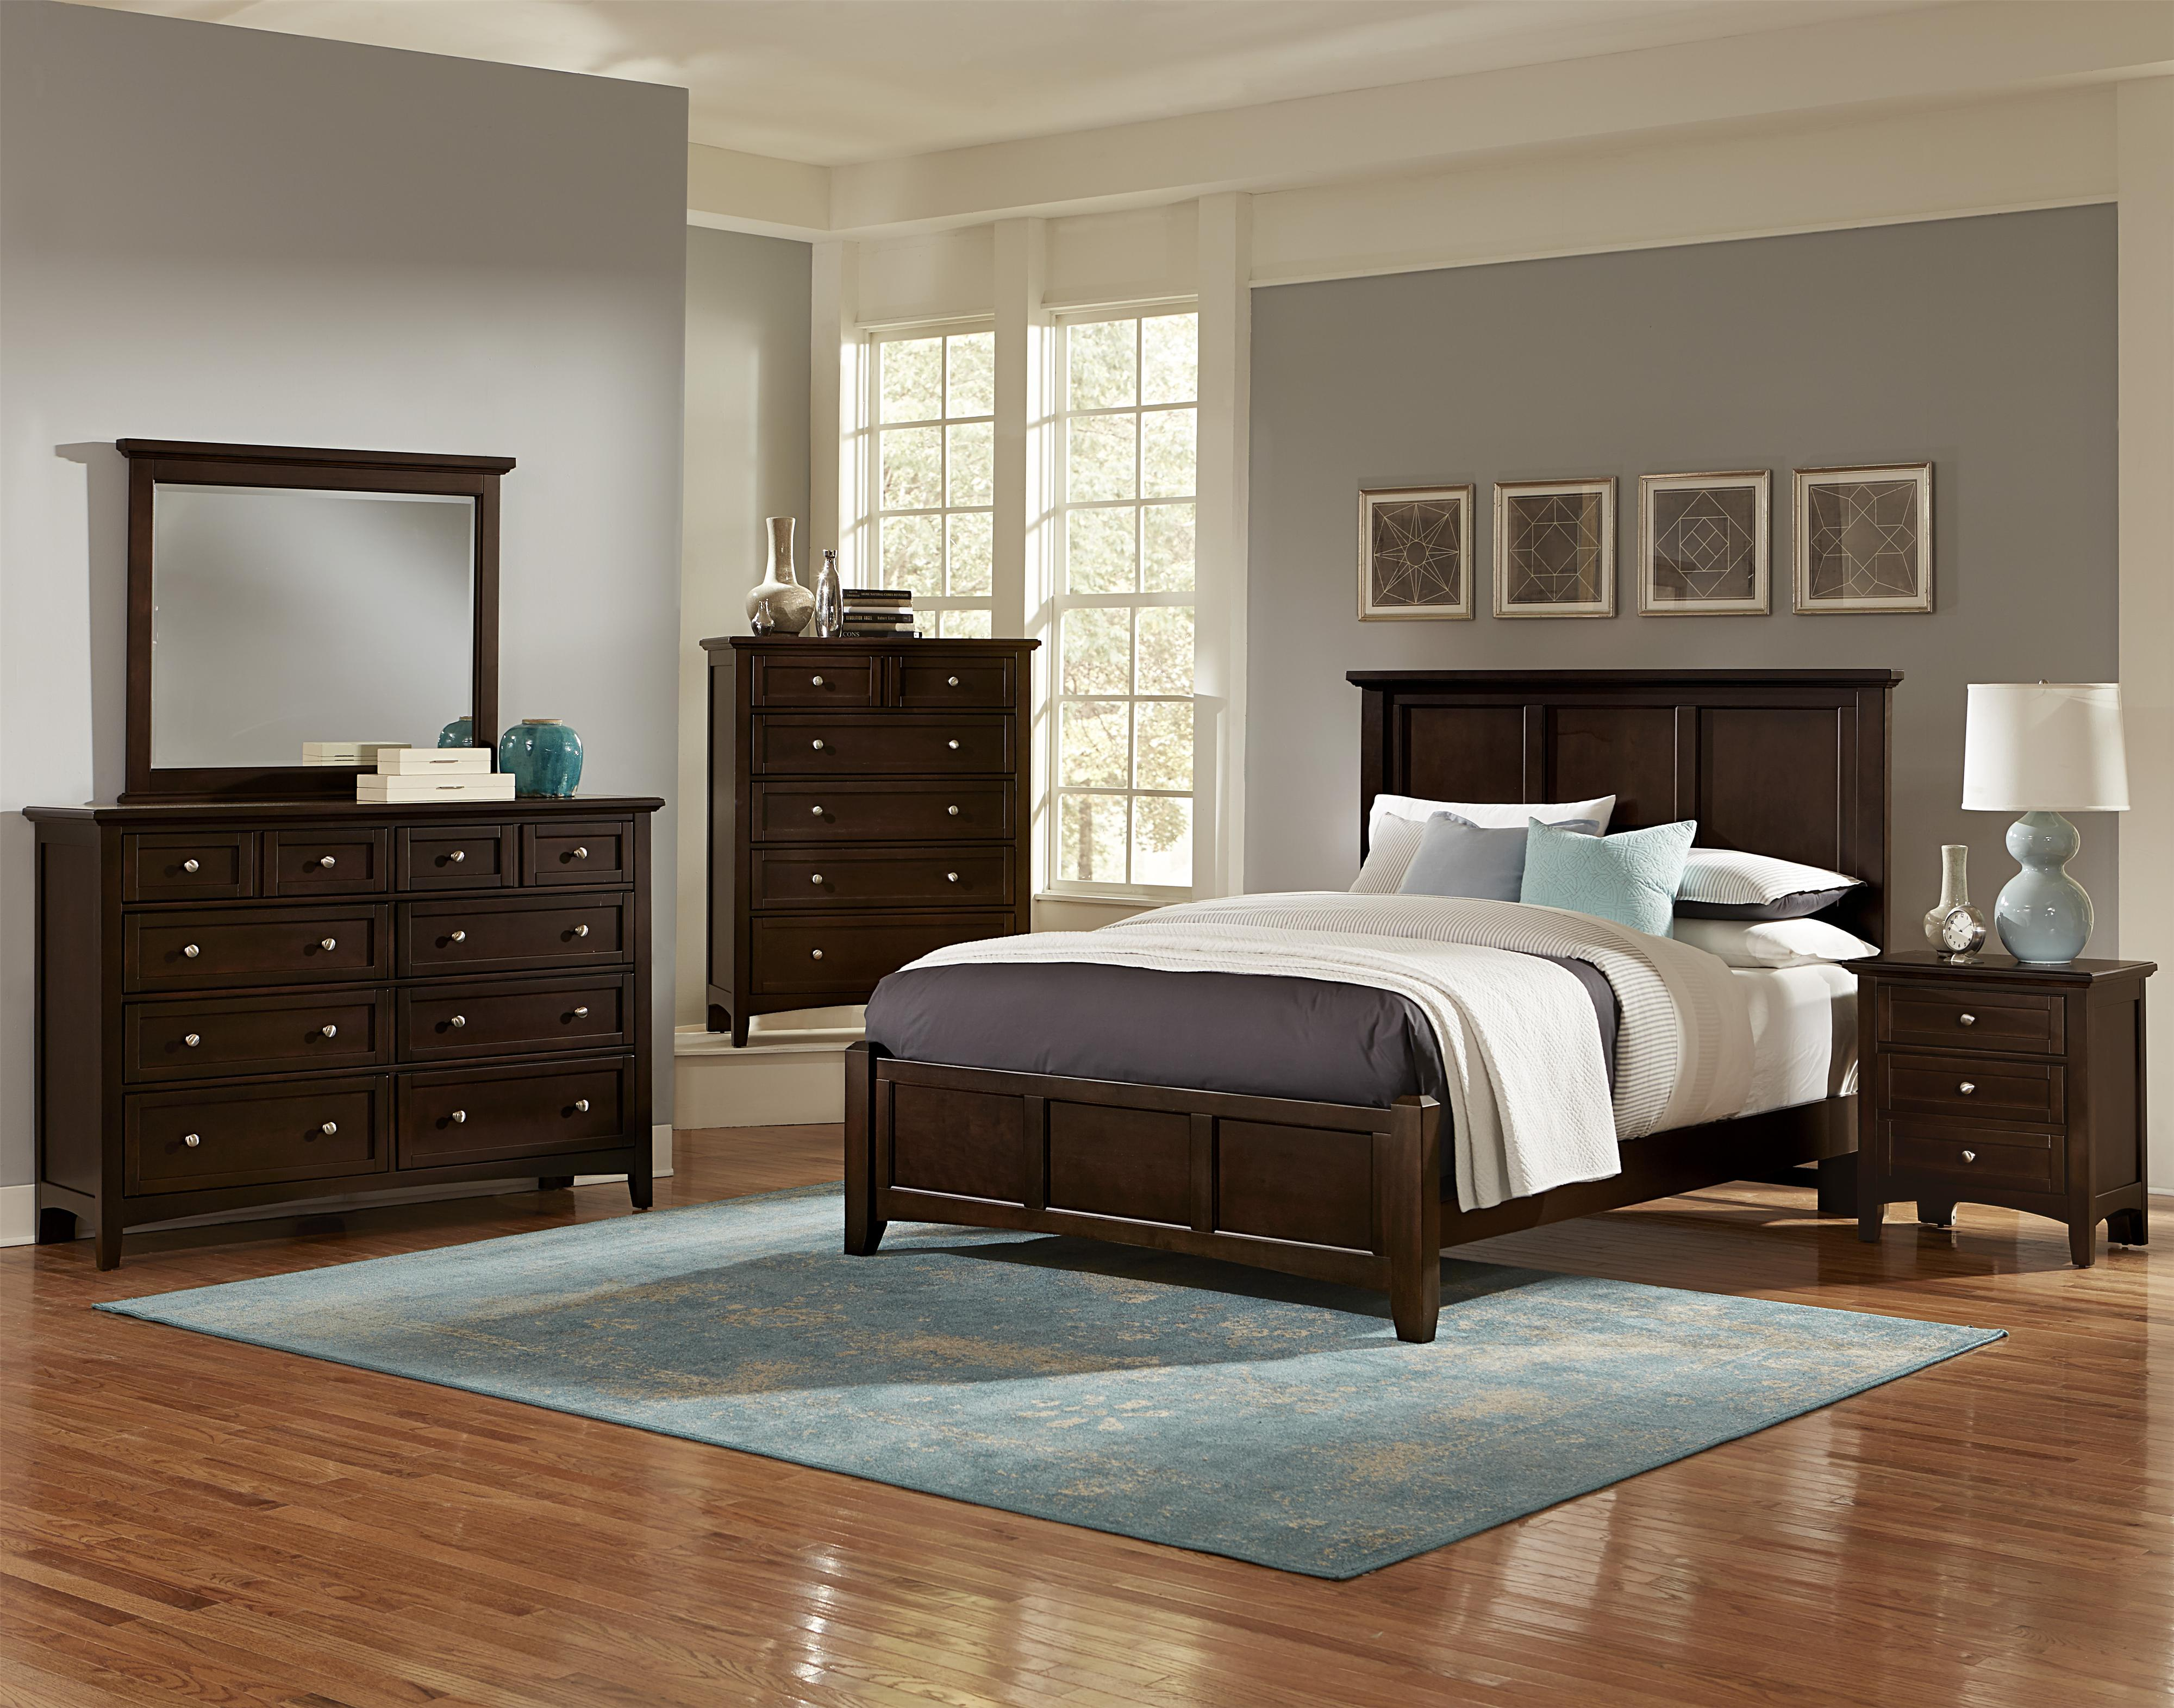 Vaughan Bassett Bonanza Bb27 002 Casual Triple Dresser 8 Drawers Hudson 39 S Furniture Dressers